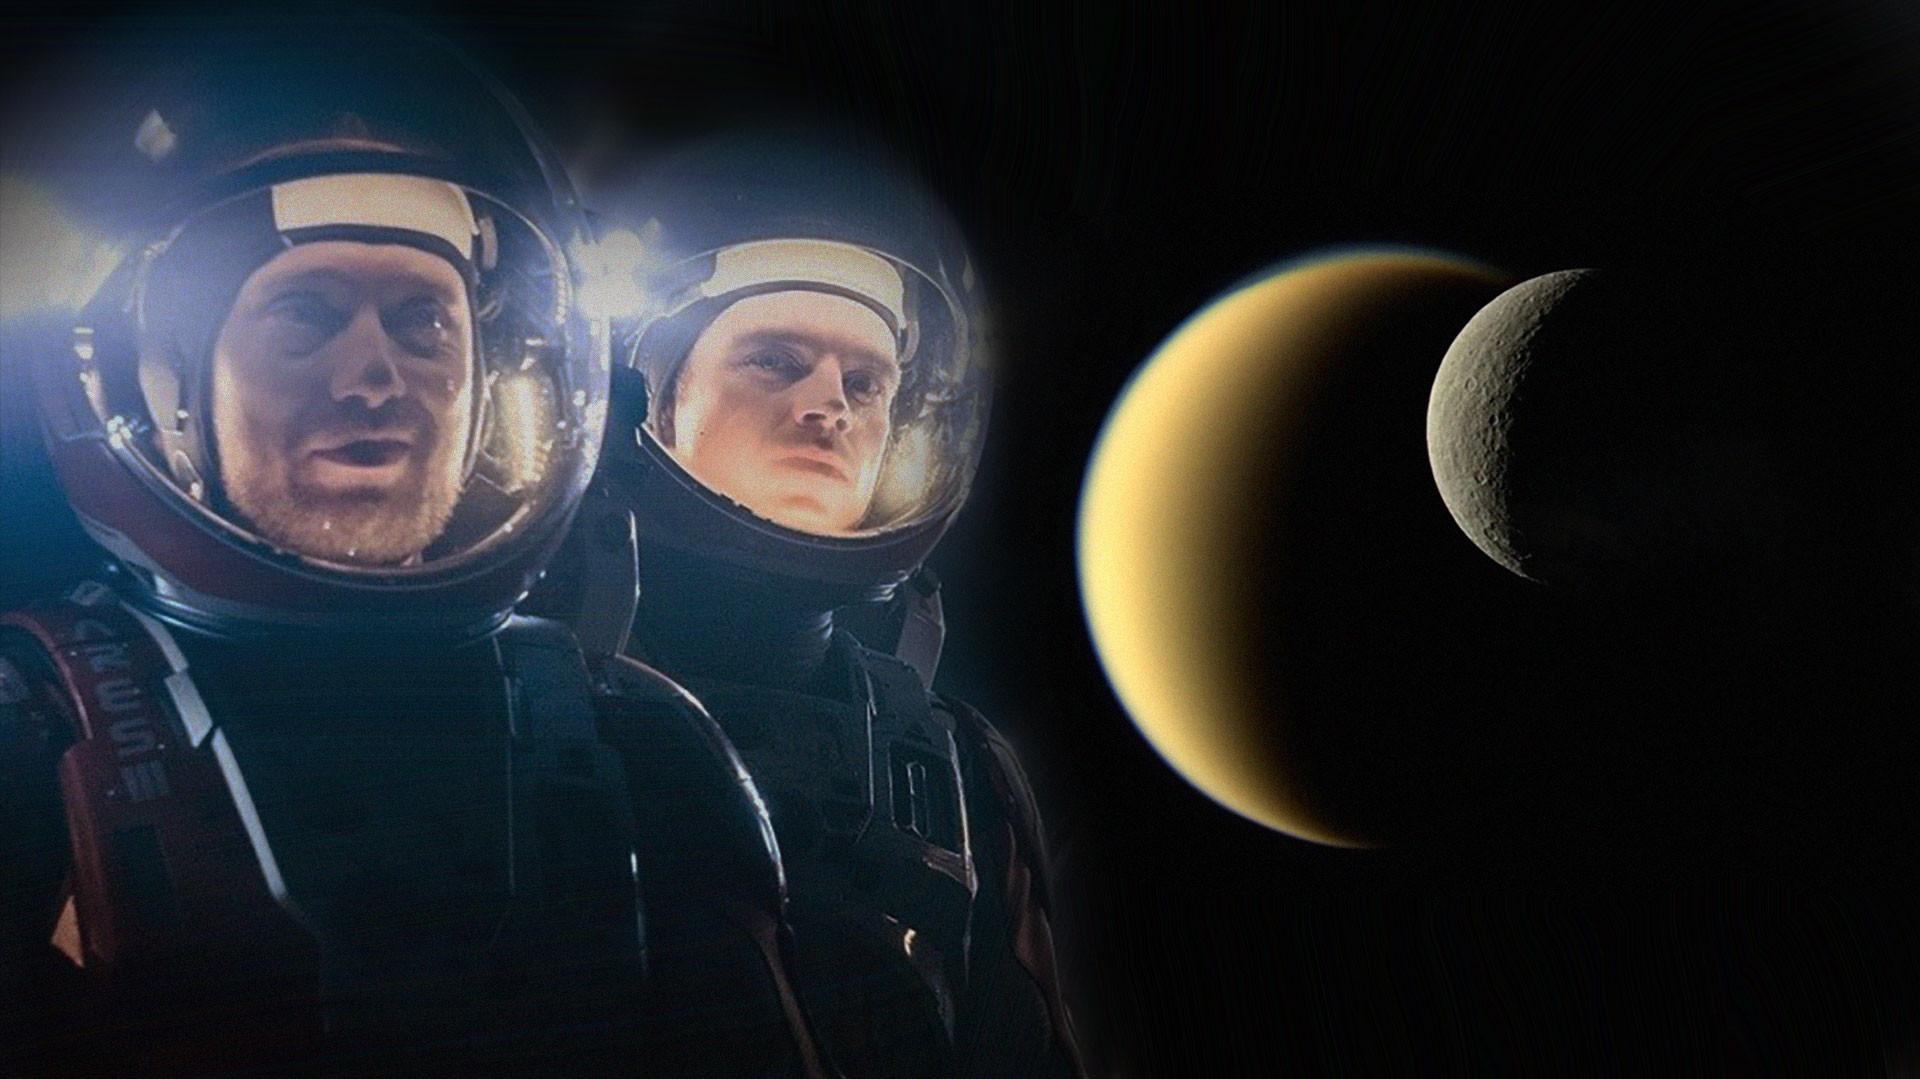 "<p>Коллаж &copy; L!FE. Фото &copy; Flickr/<a href=""https://www.flickr.com/photos/nasamarshall/"" title=""Go to NASA's Marshall Space Flight Center's photostream"" data-track=""attributionNameClick"" data-rapid_p=""39"">NASA's Marshall Space Flight Center</a>// Кадр фильма ""Марсианин""/ &copy; Кинопоиск</p>"